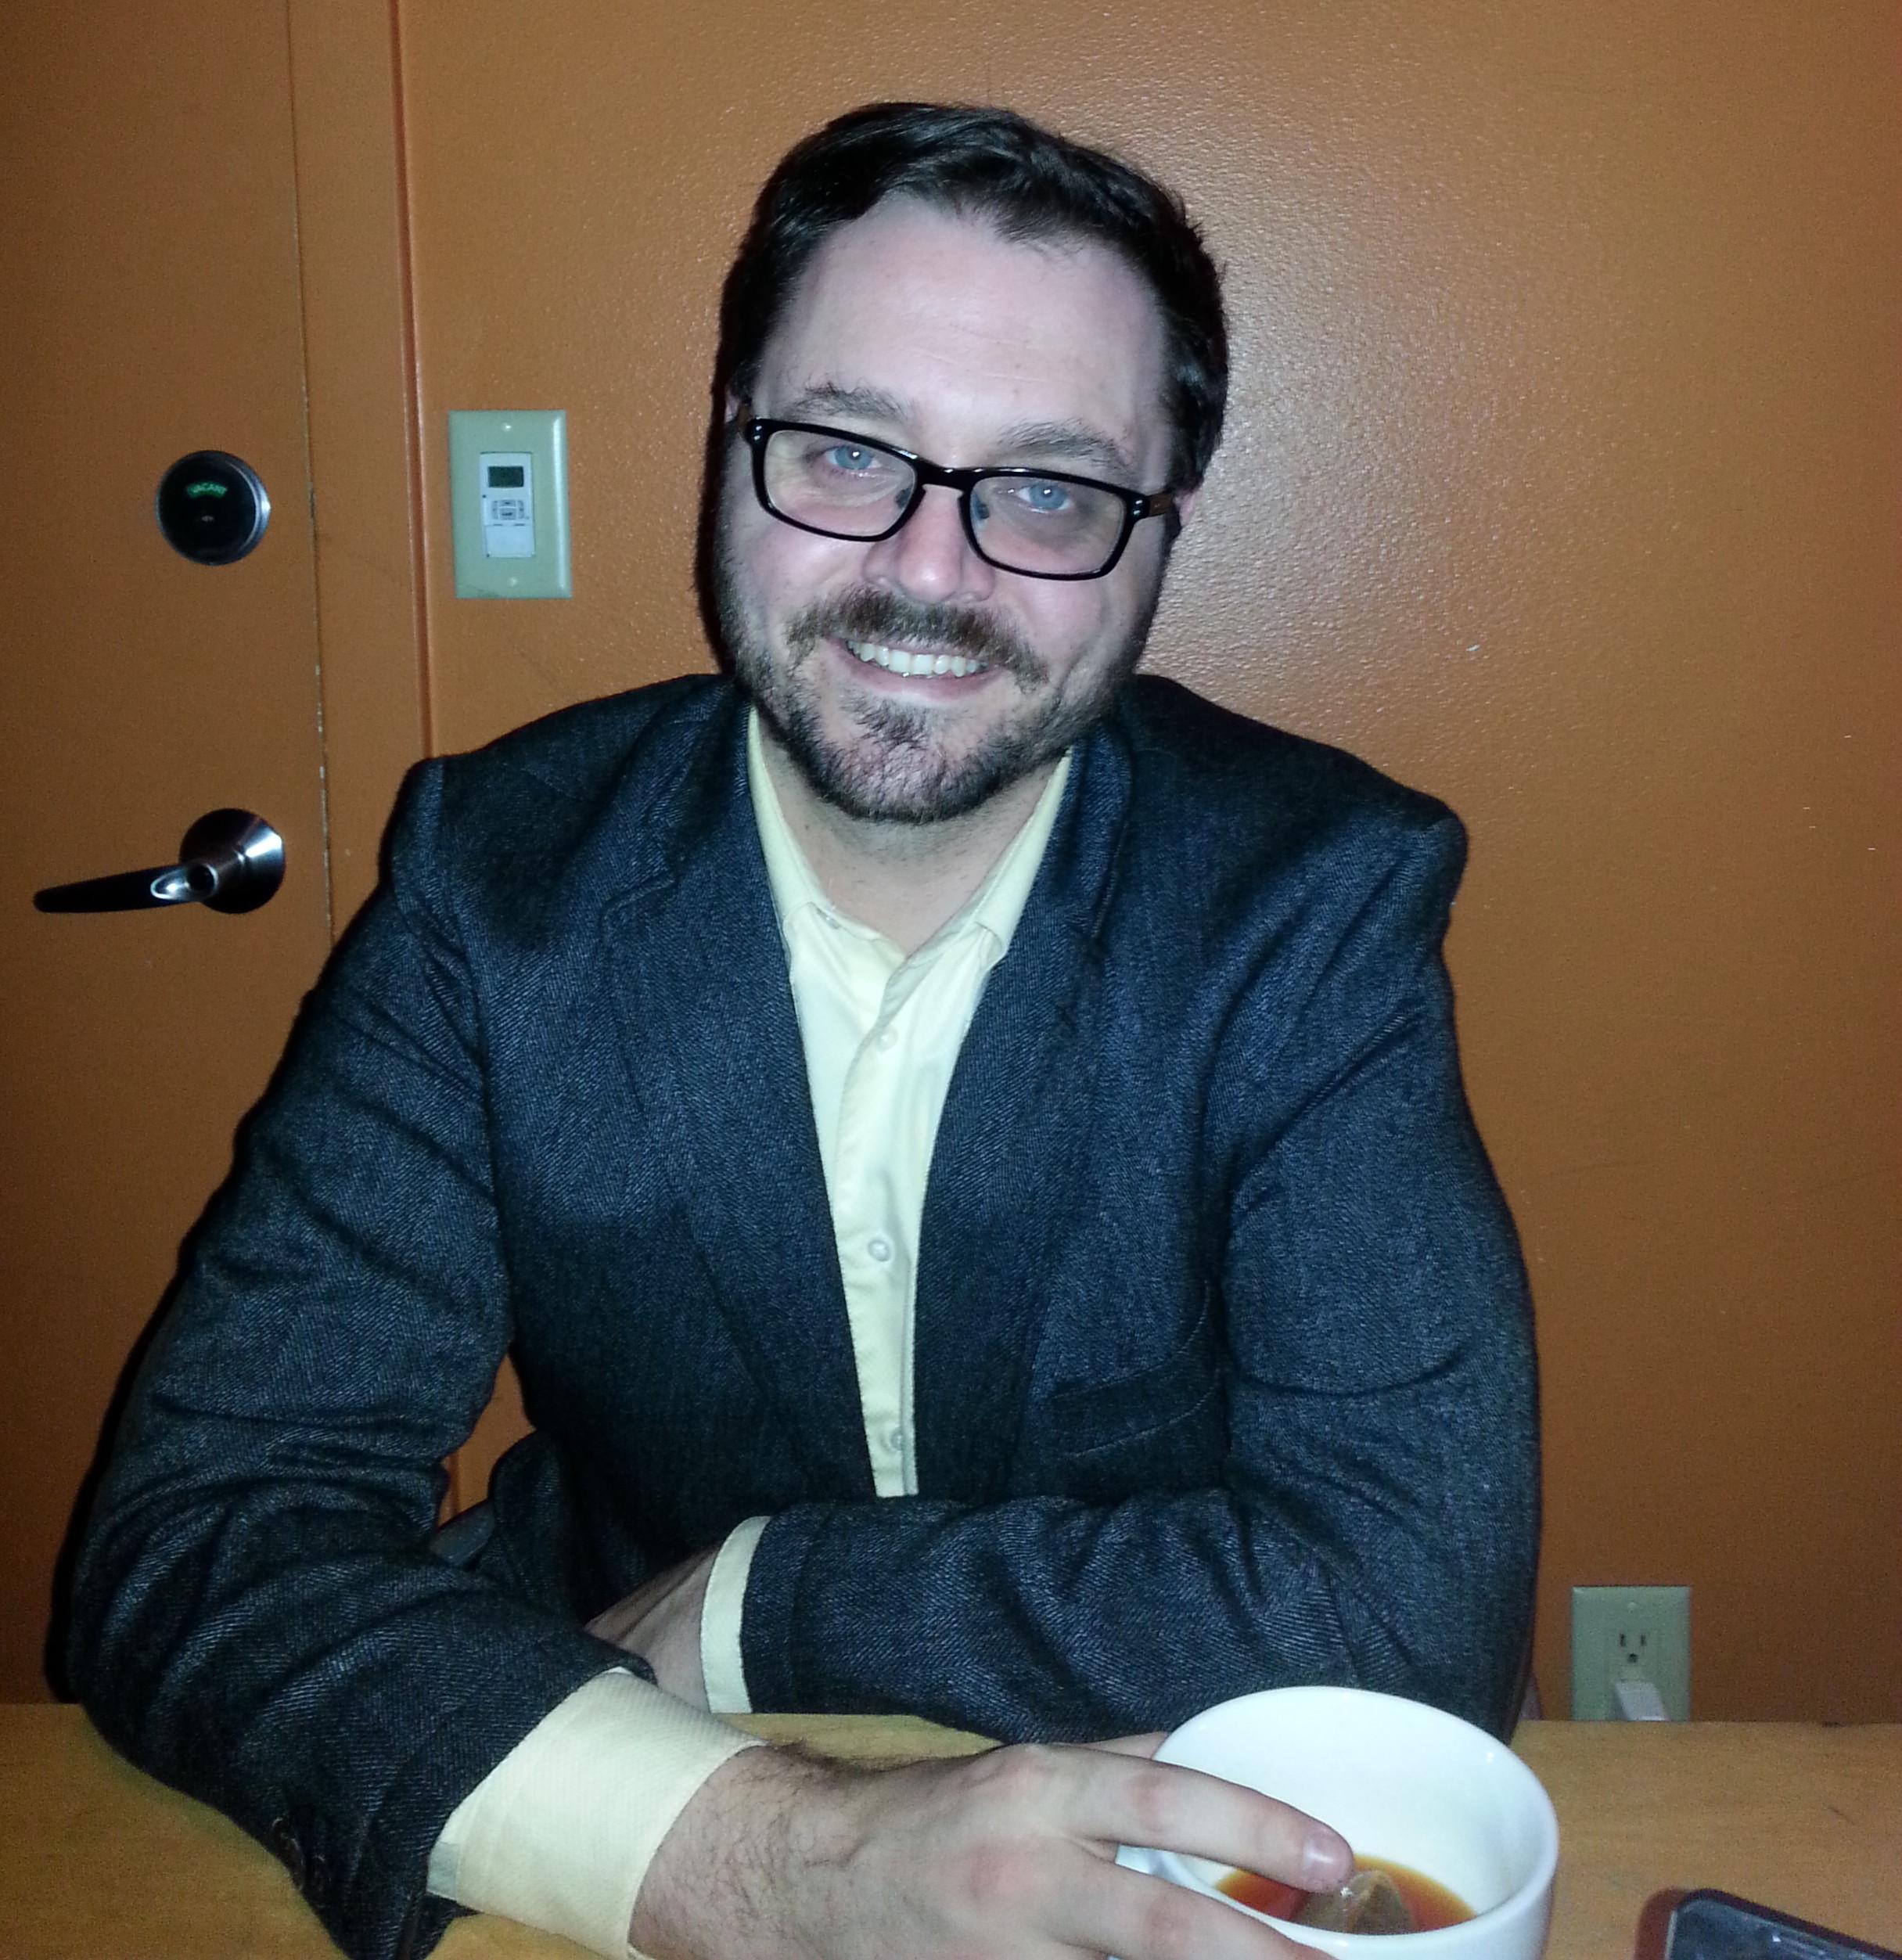 City Council candidate Jon Grant (Image: Casey Jaywork)